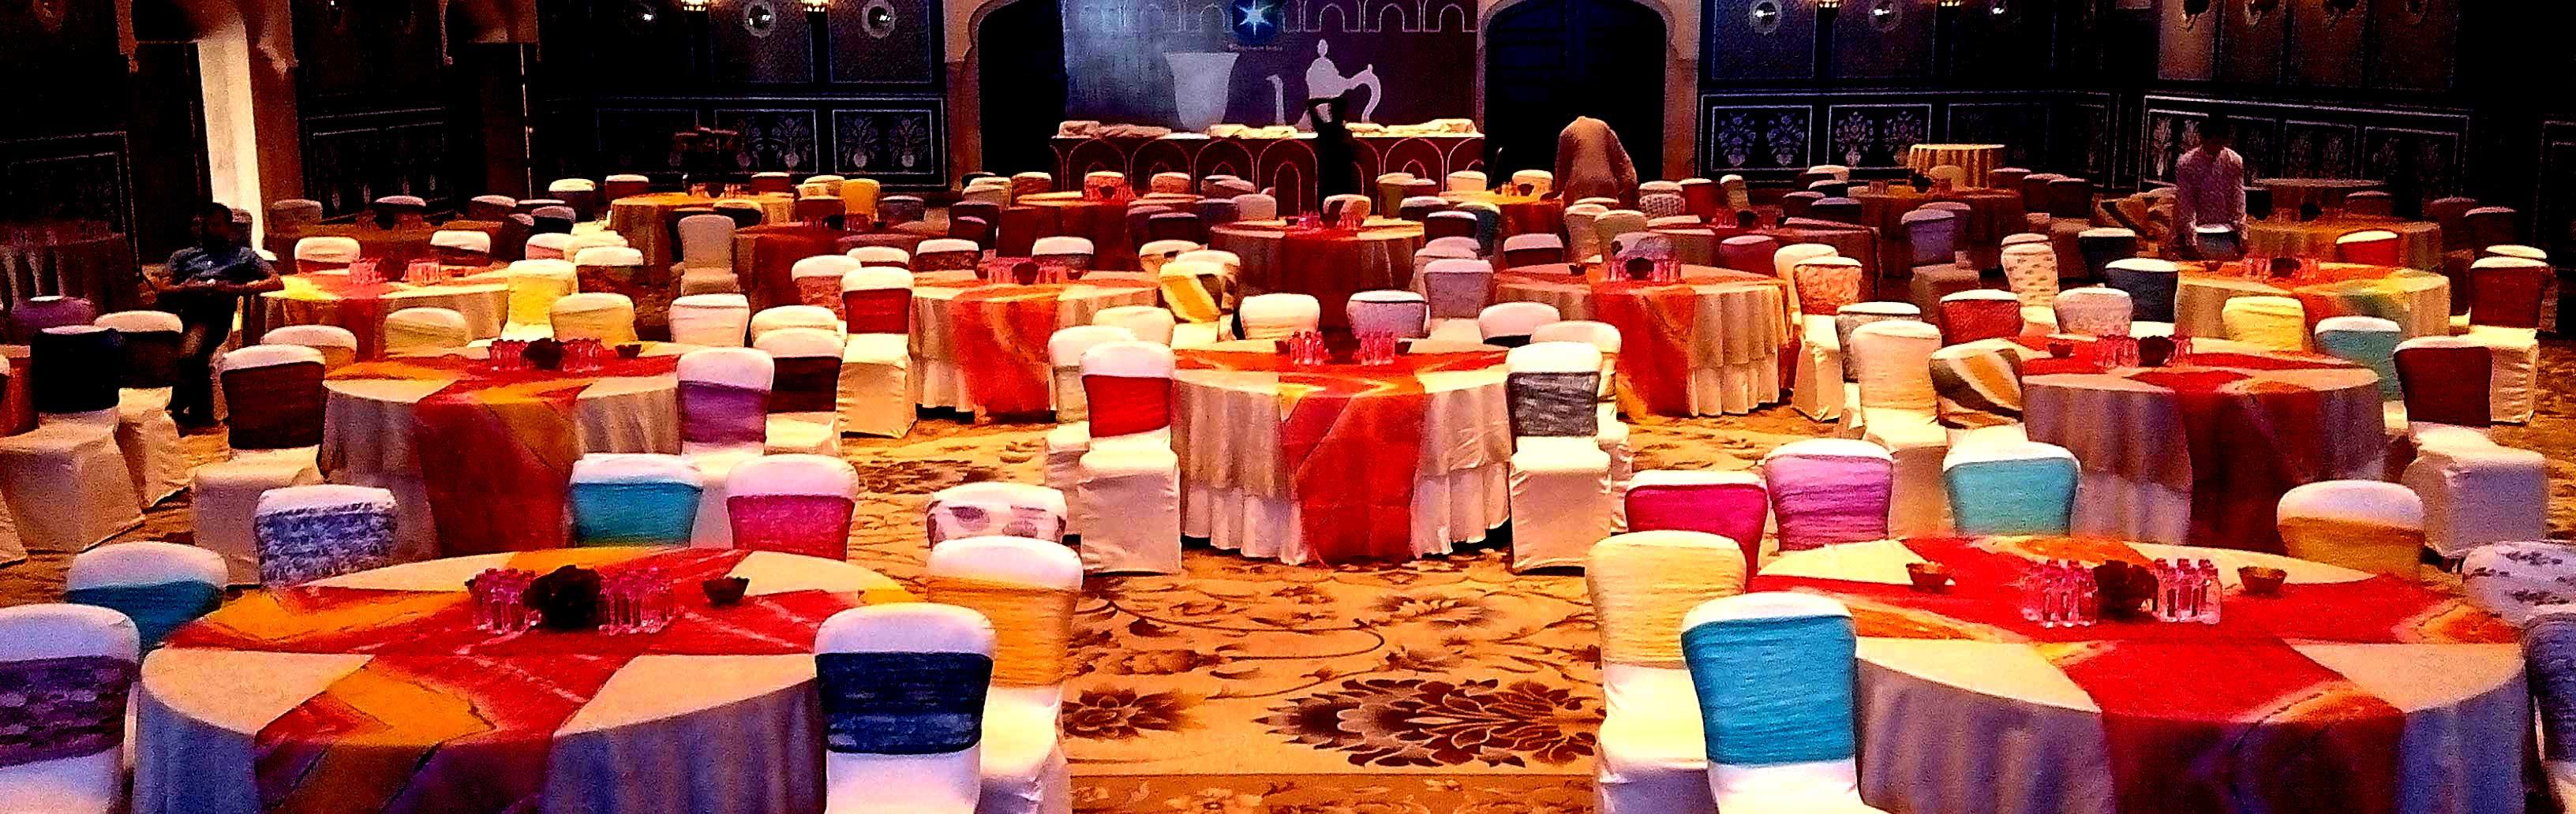 Exclusive Rajasthani Theme Set-Up